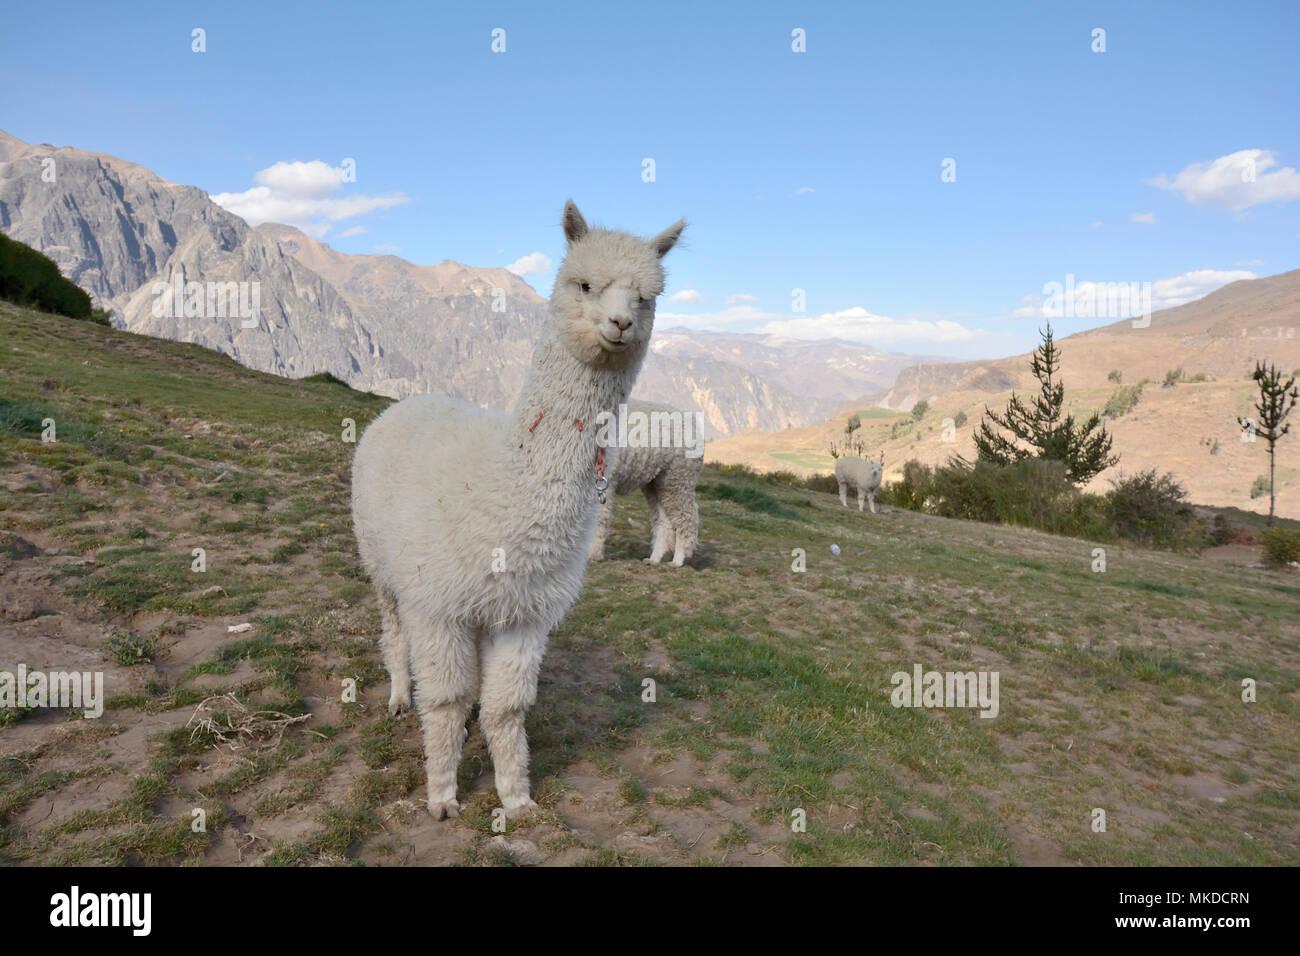 Alpaca (Vicugna pacos), La Granja del Colca Lodge, Colca Canyon, Arequipa Region, Peru - Stock Image